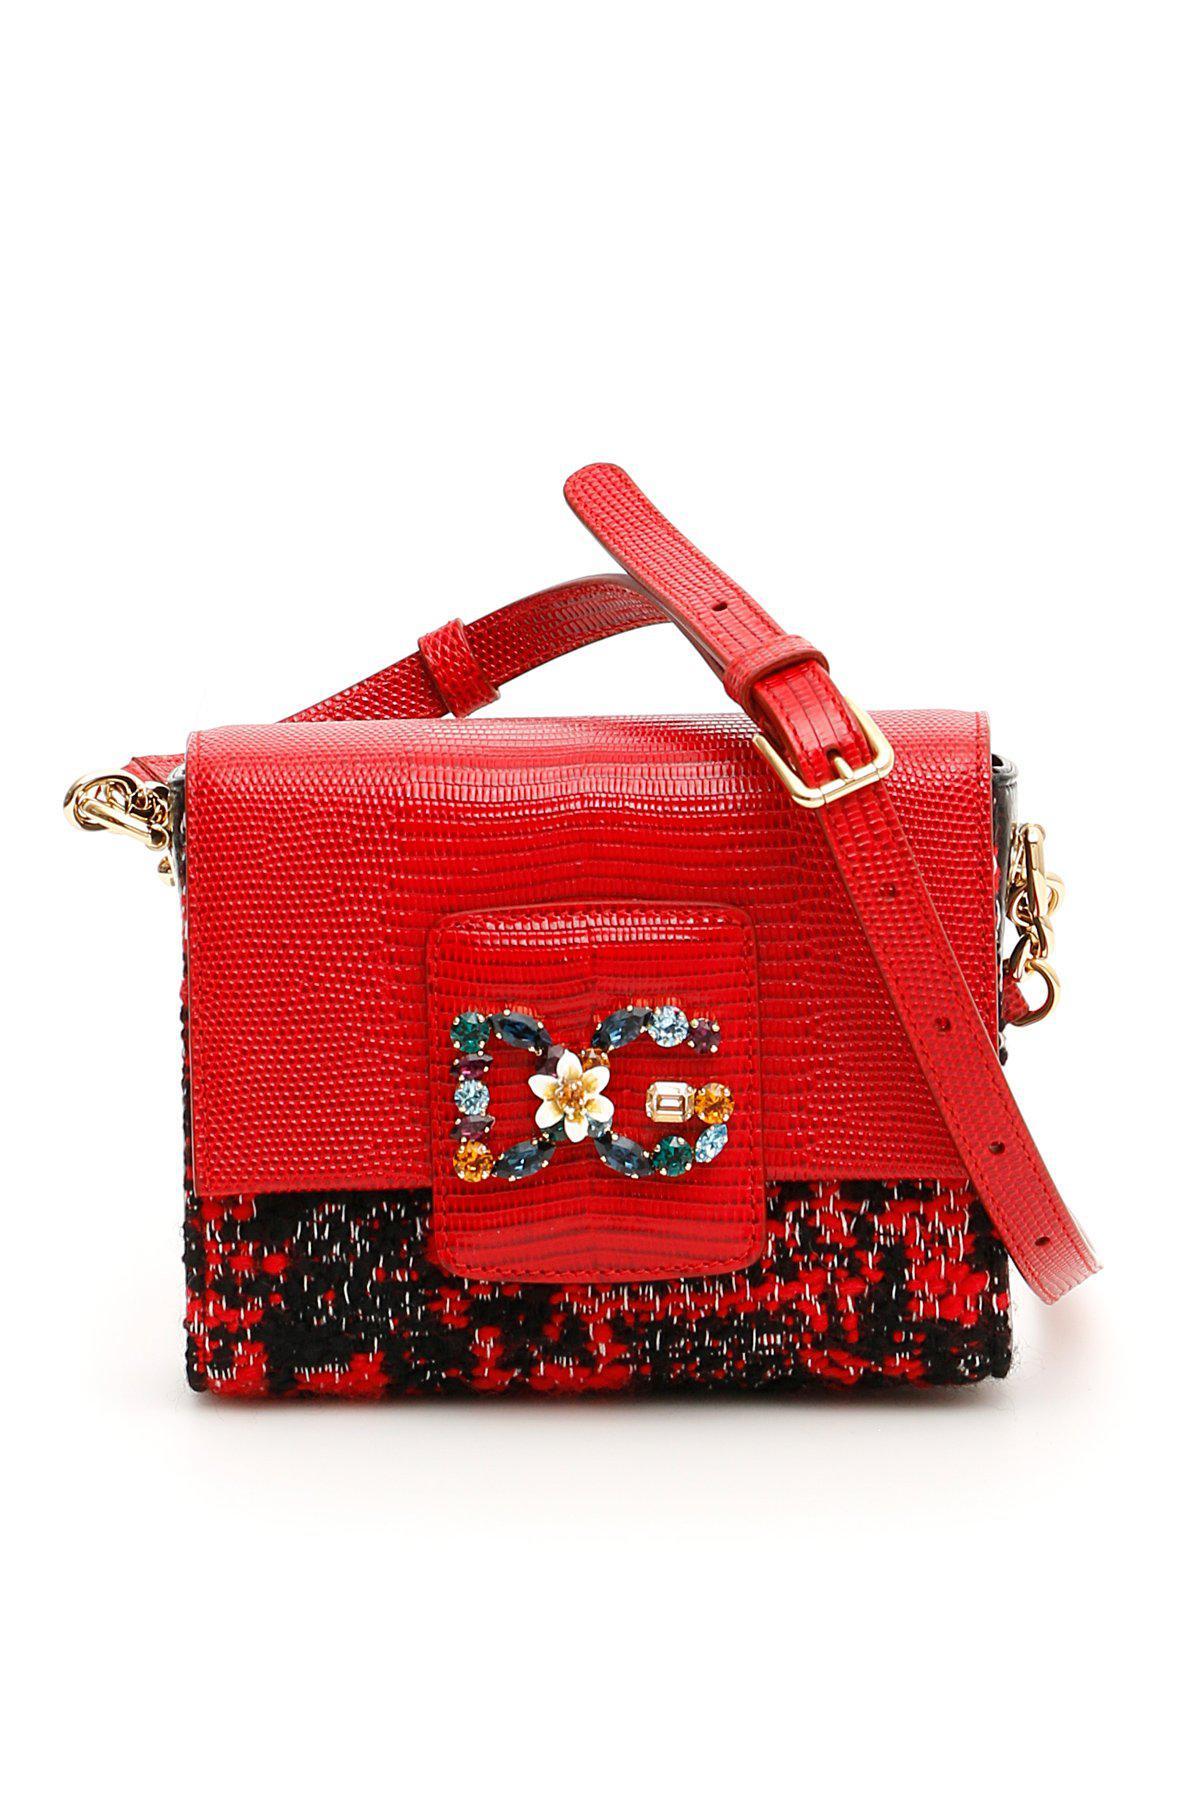 Dolce   Gabbana Mini Dg Millennials Crossbody Bag in Red - Save 38 ... 5bd24935ab9d5